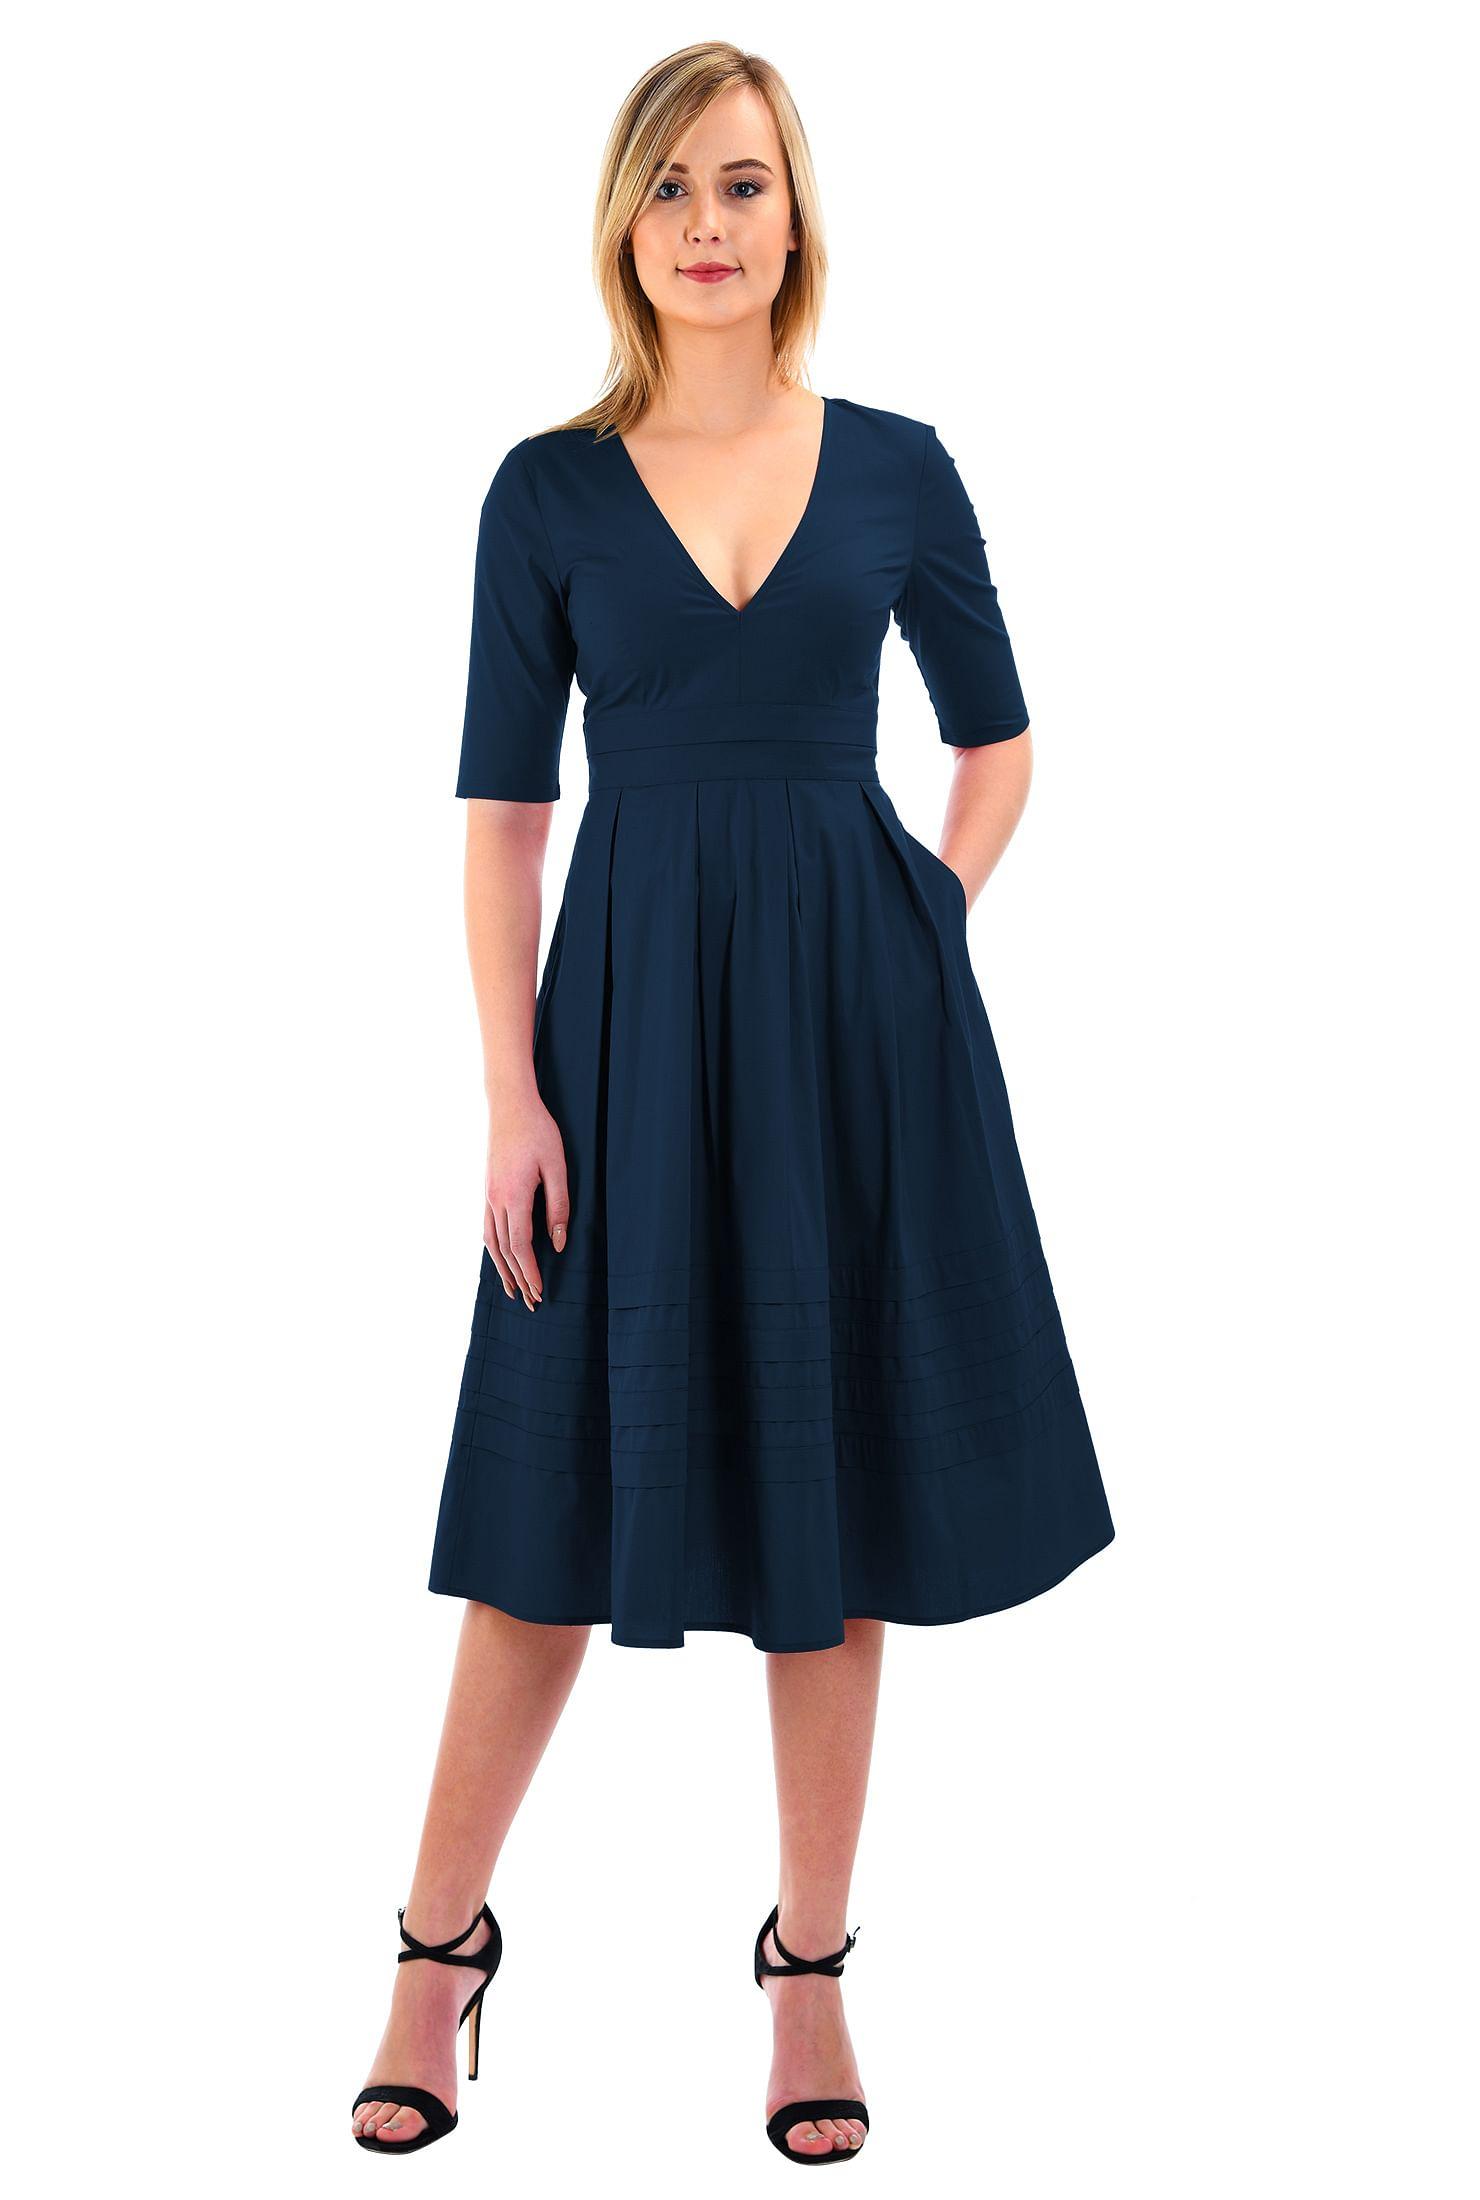 83f27e9bc20cd Women's Fashion Clothing 0-36W and Custom